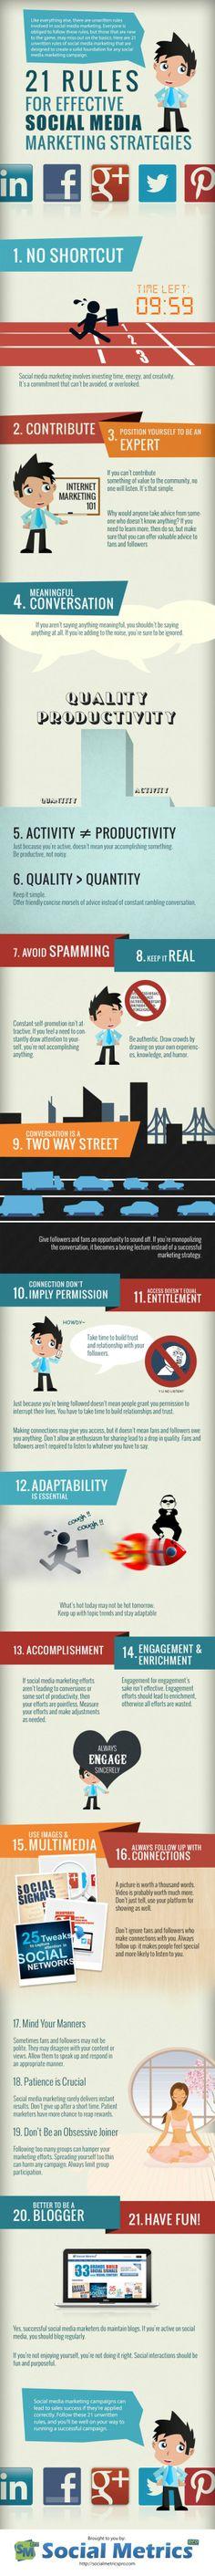 21 Rules For #Healthcare #SocialMedia #Marketing